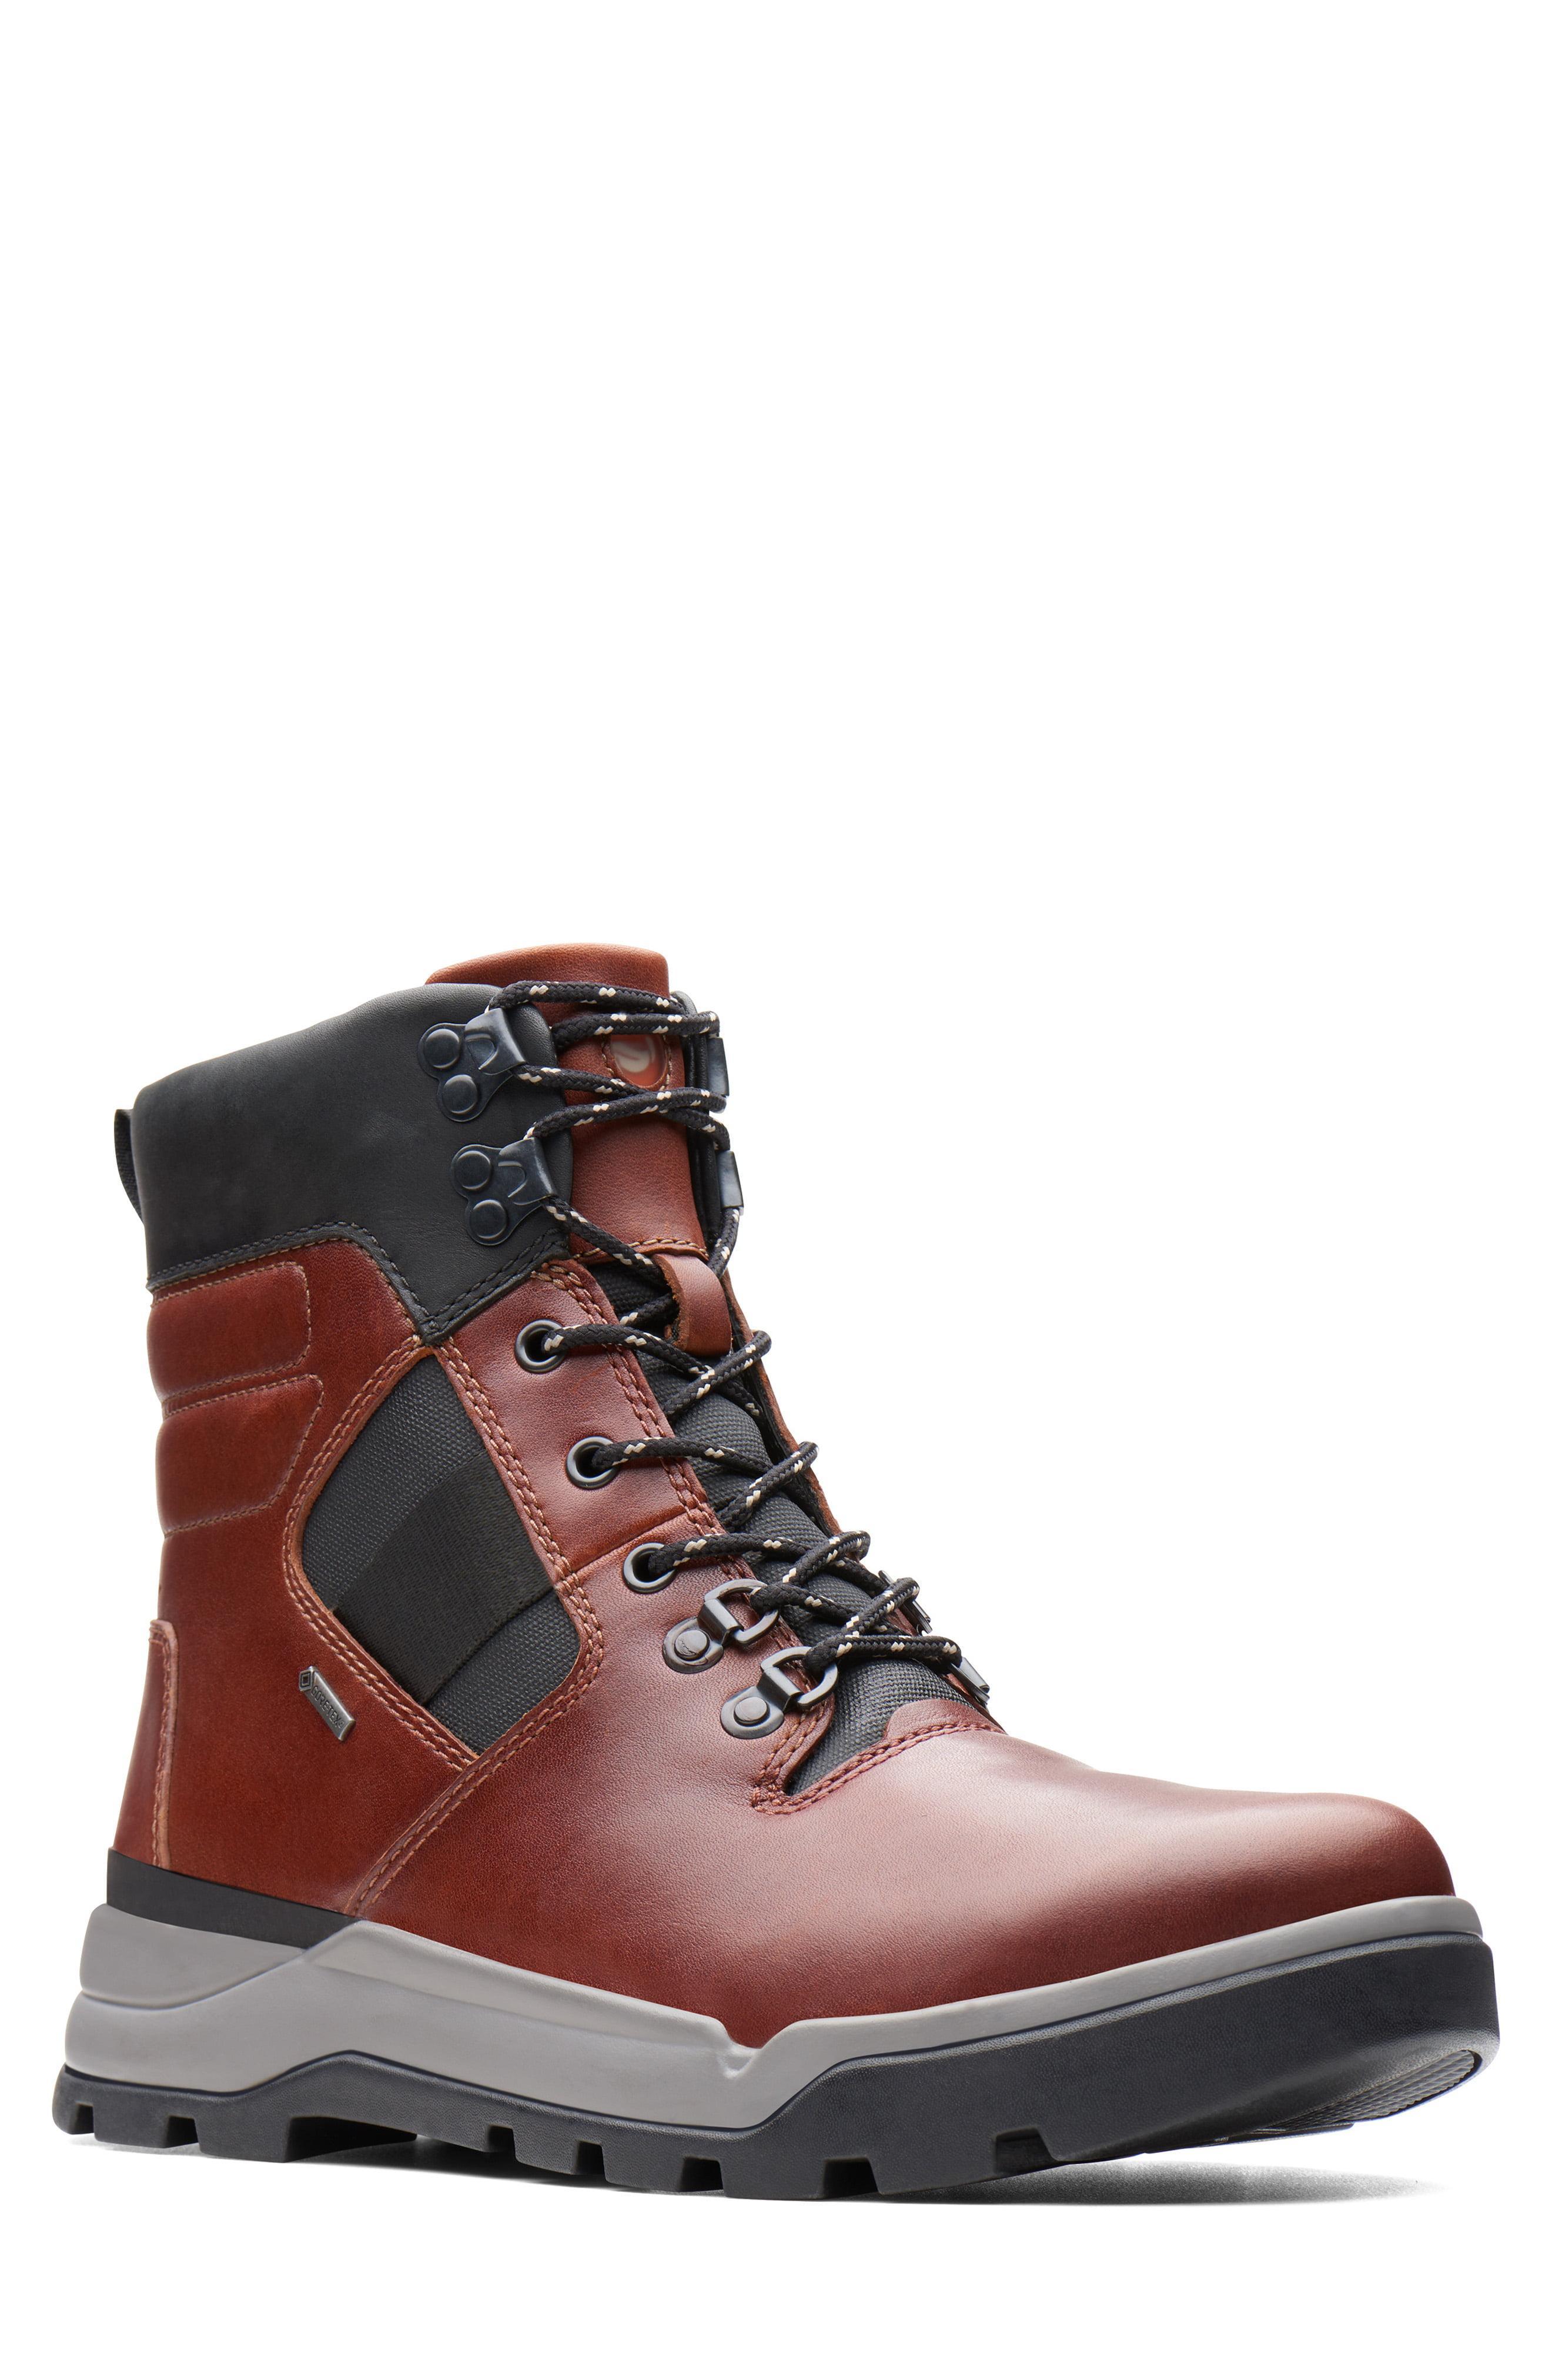 Atlas Higtx in Dark Tan Leather